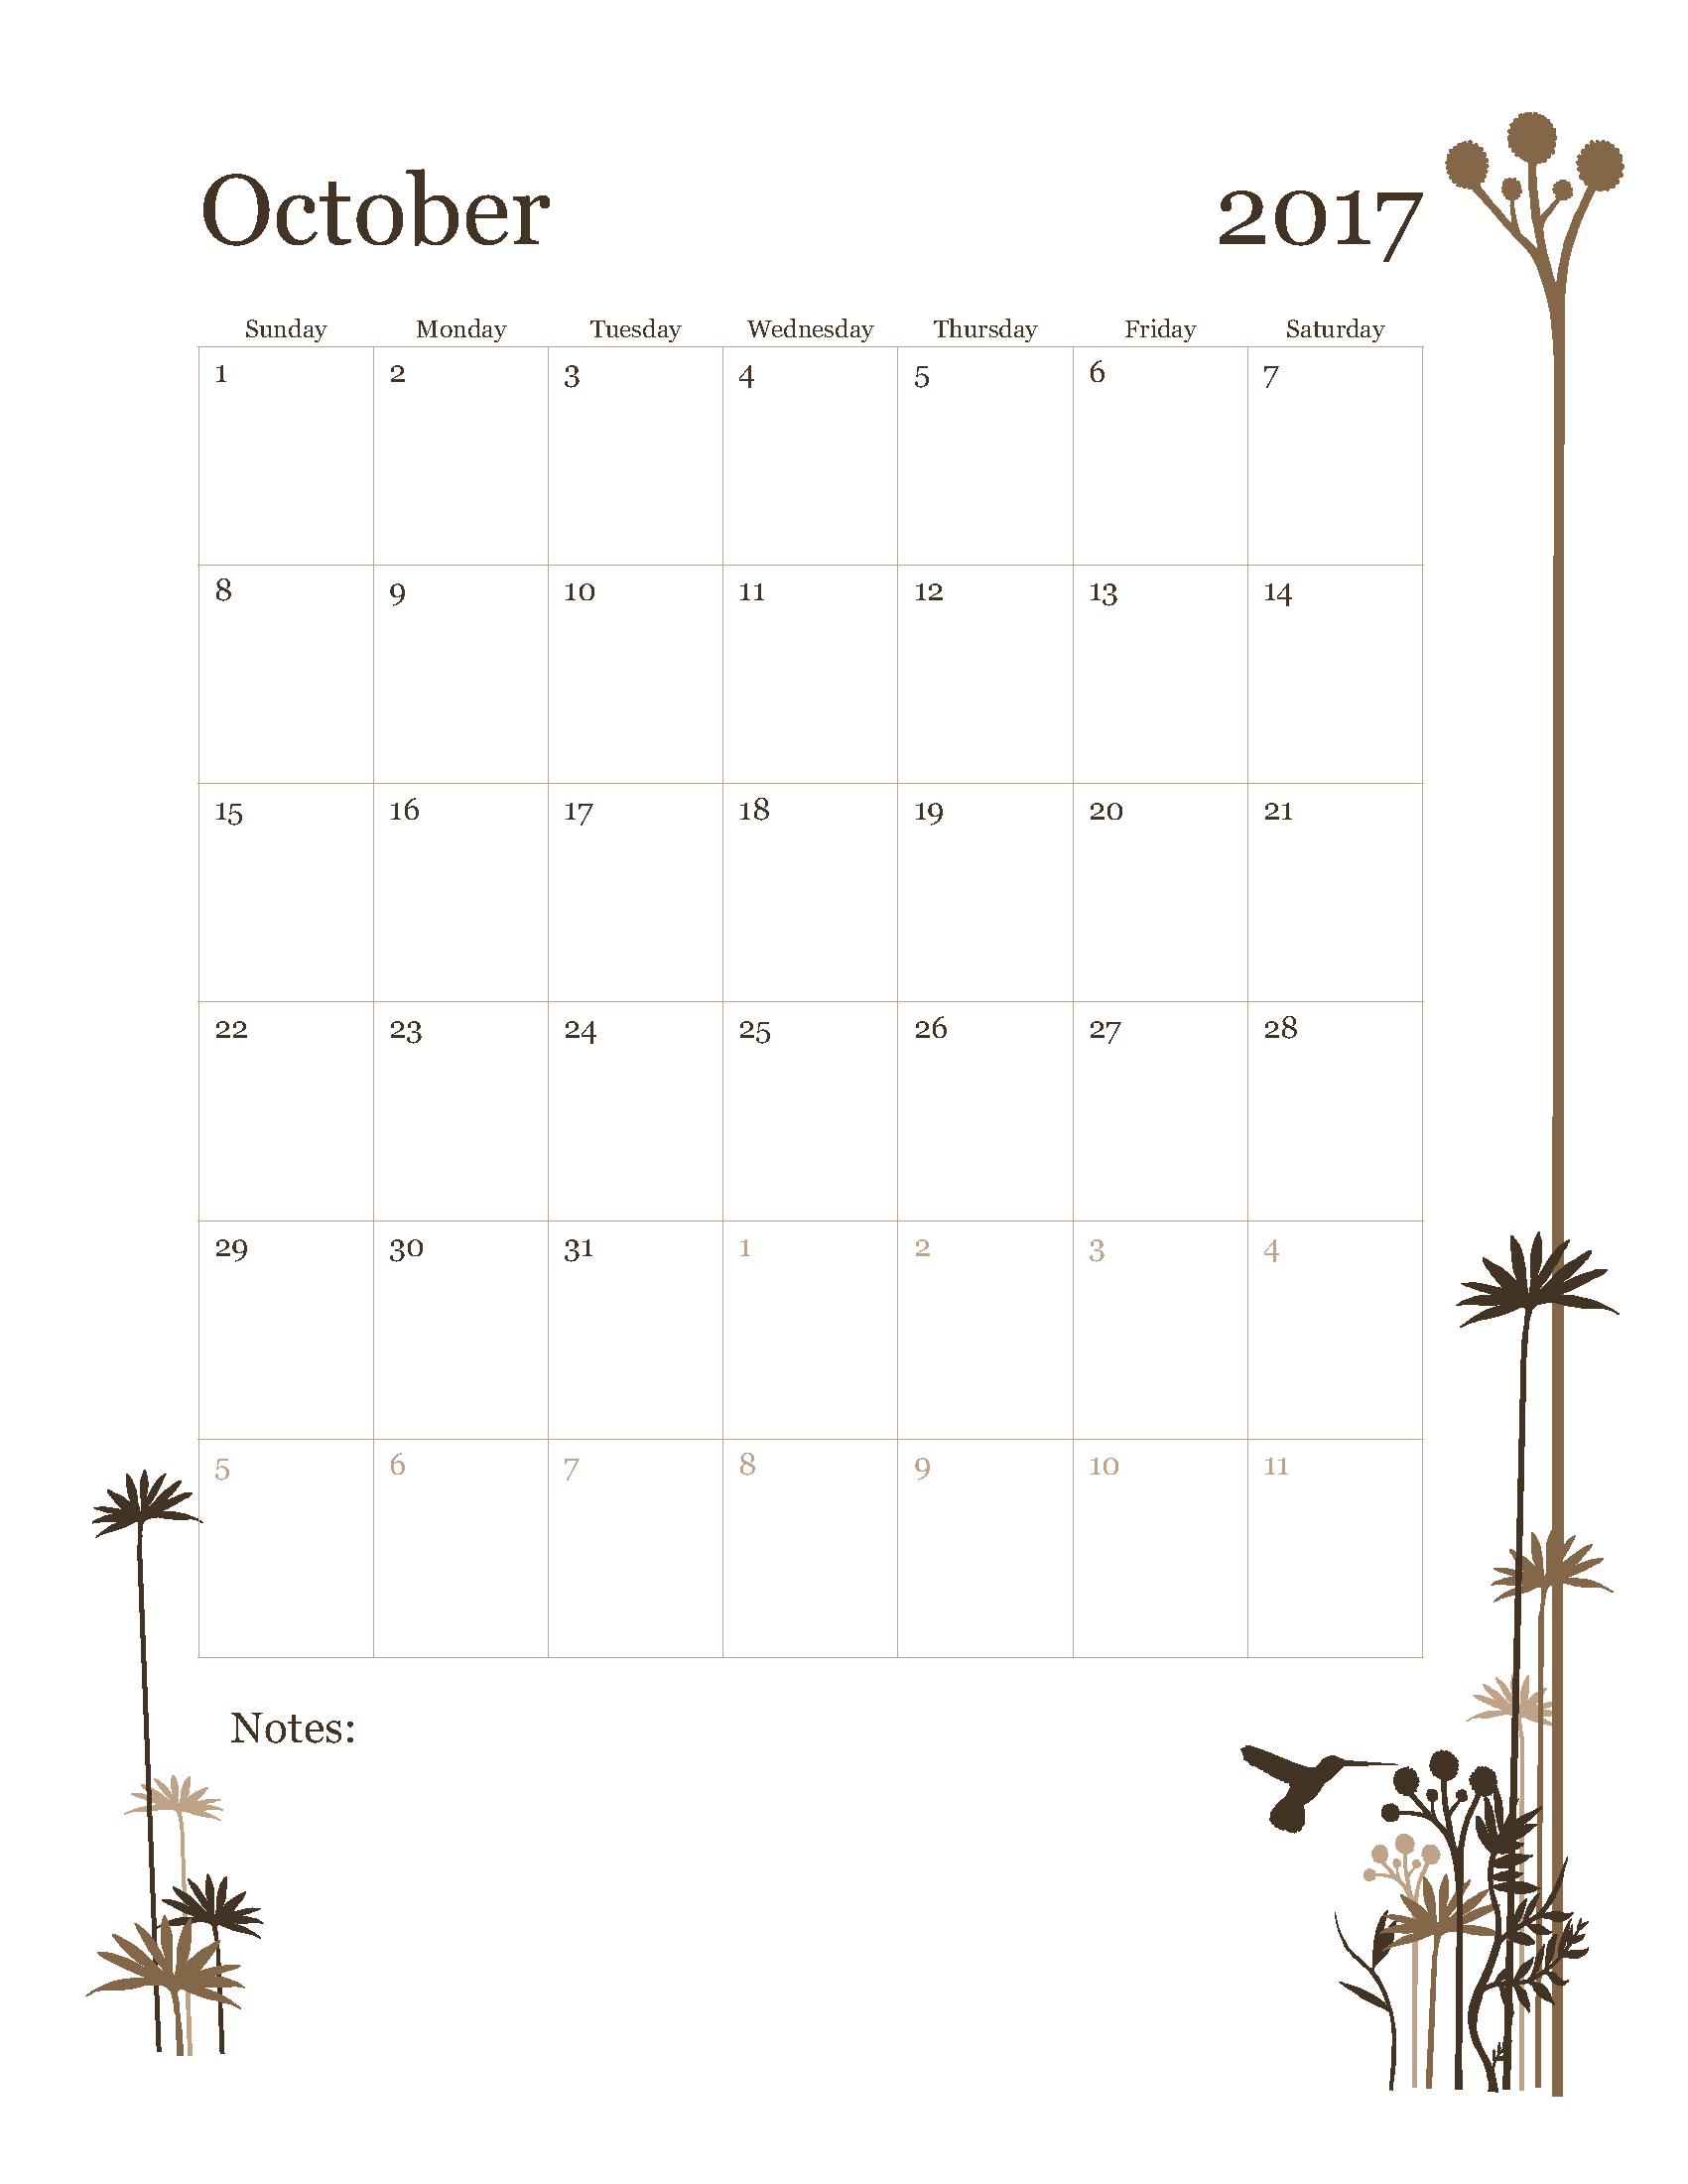 Free October 2017 Calendar Template Printable Start on Sunday - HummingBird design